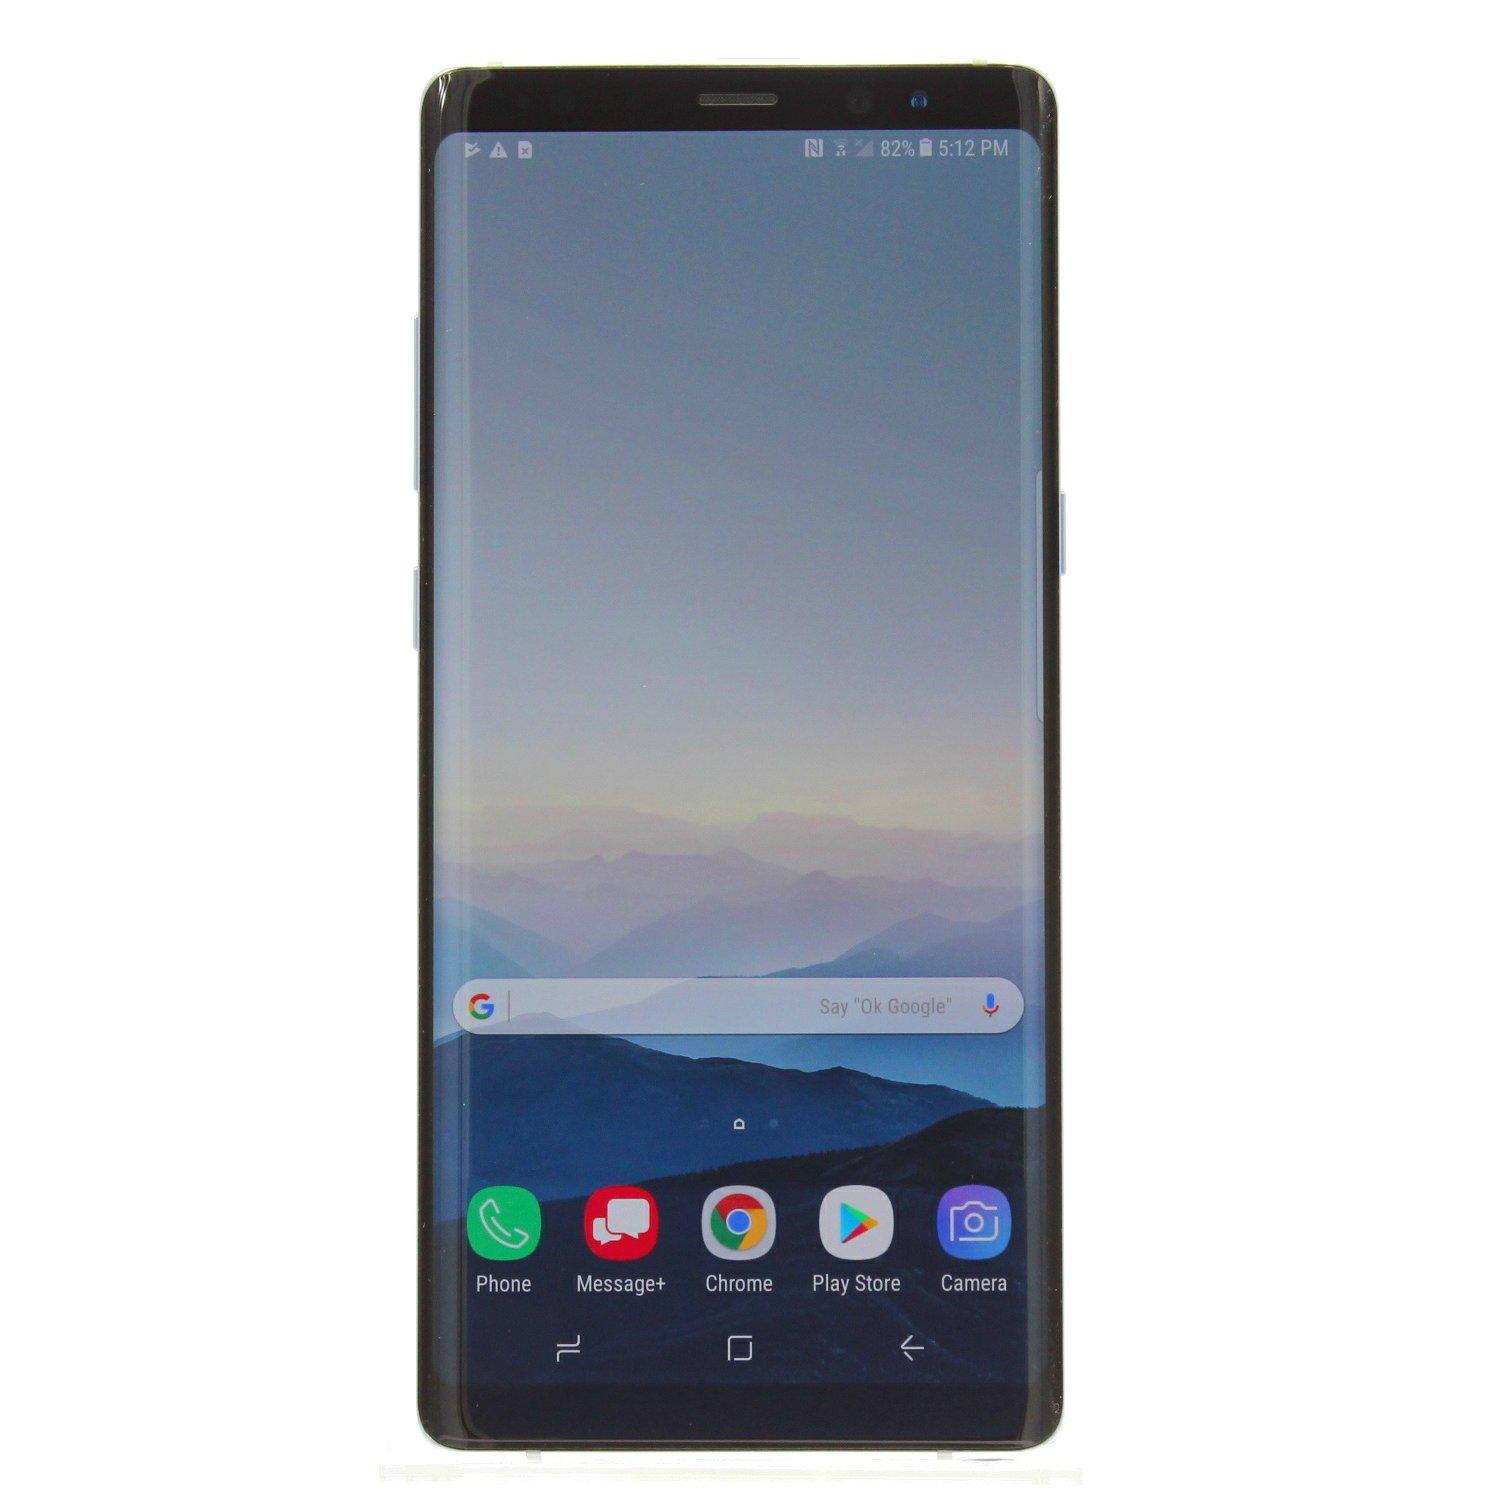 Samsung Galaxy Note 8 SM-N950U 64GB for AT&T (Certified Refurbished)